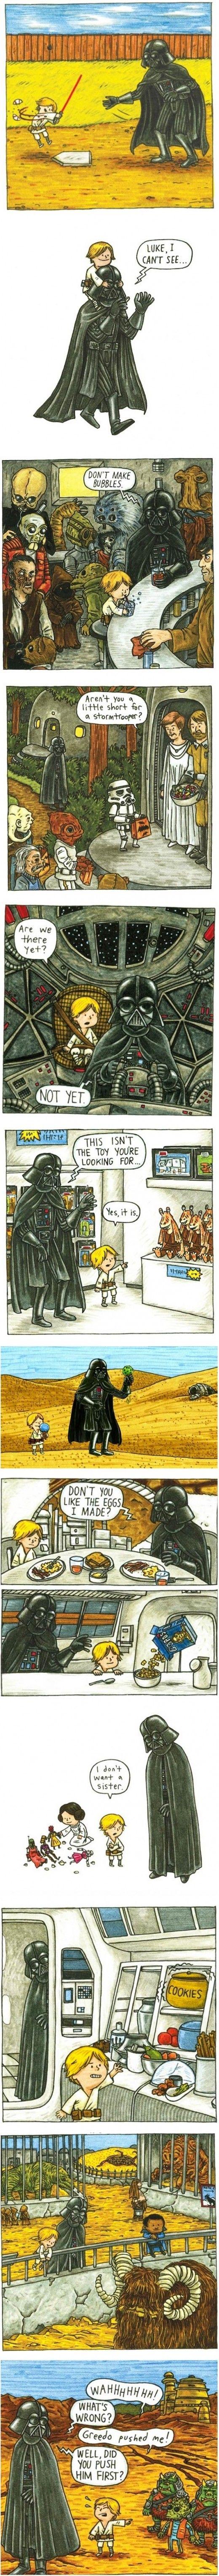 Darth Vader, a good dad?